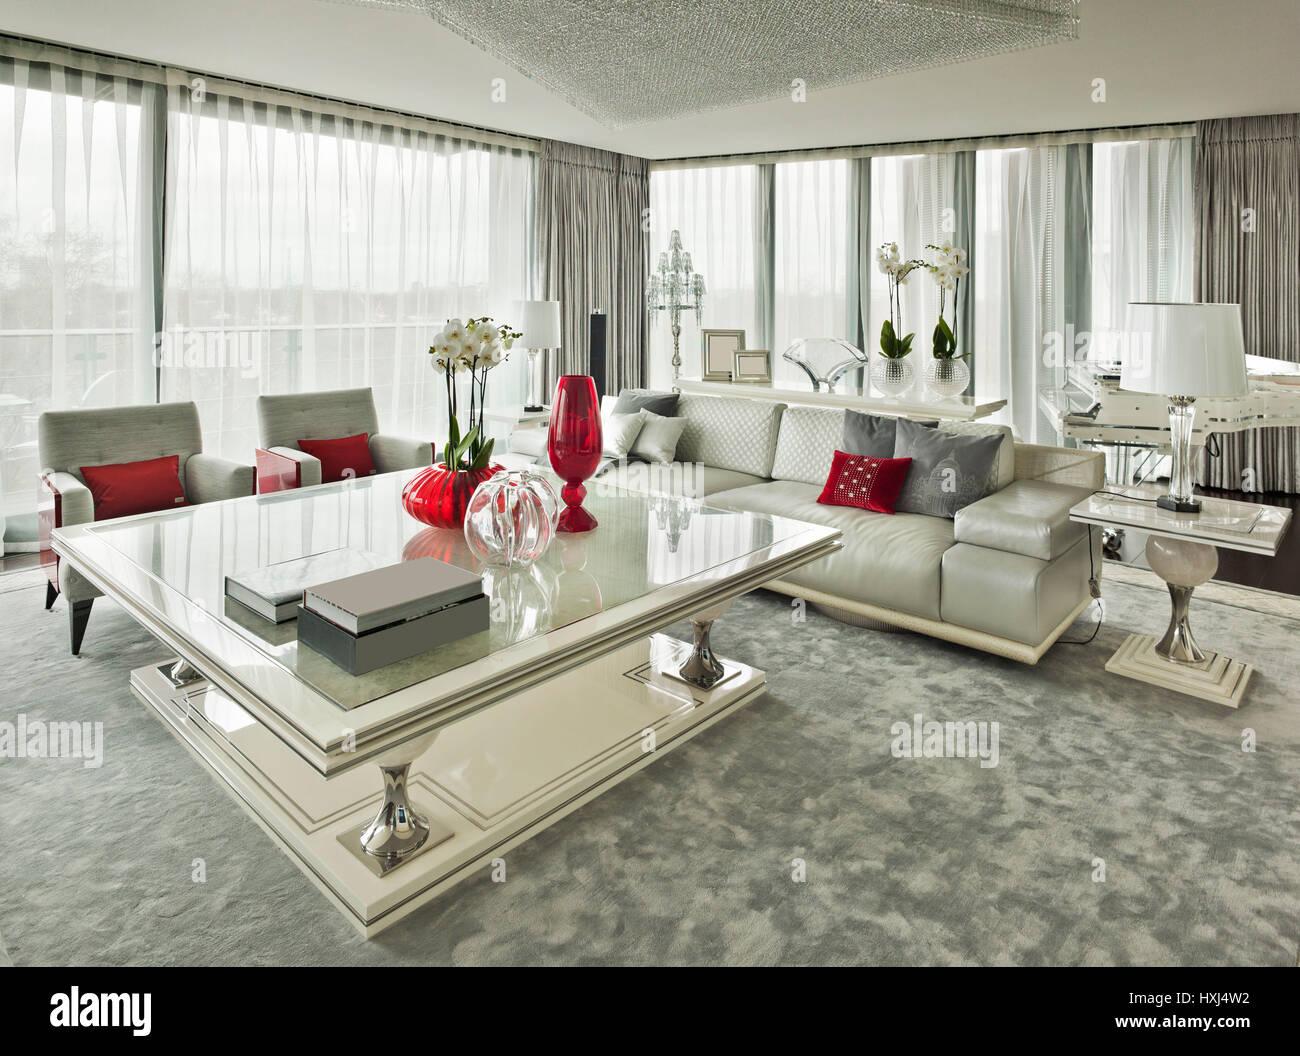 Interior Design Room Panoramic Windows Stockfotos & Interior Design ...